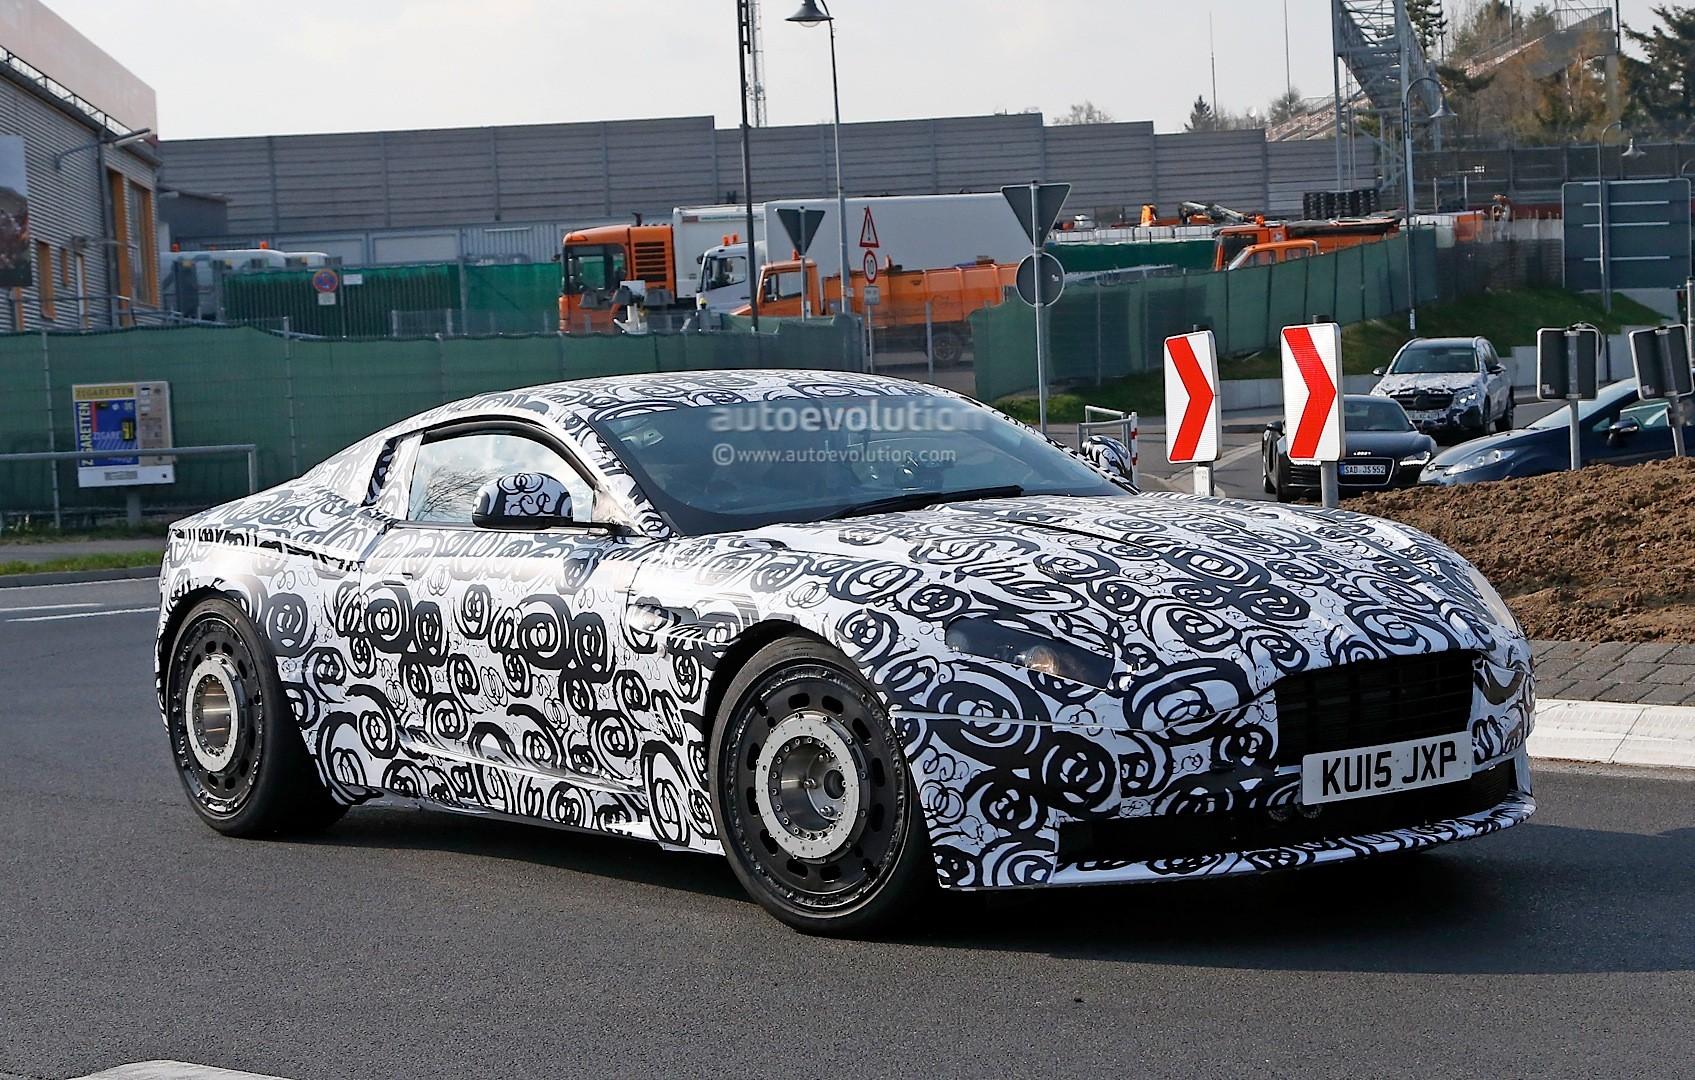 2016 - [Aston Martin] DB11 Spyshots-aston-martin-db11-prototype-seen-testing-at-the-nurburgring_12